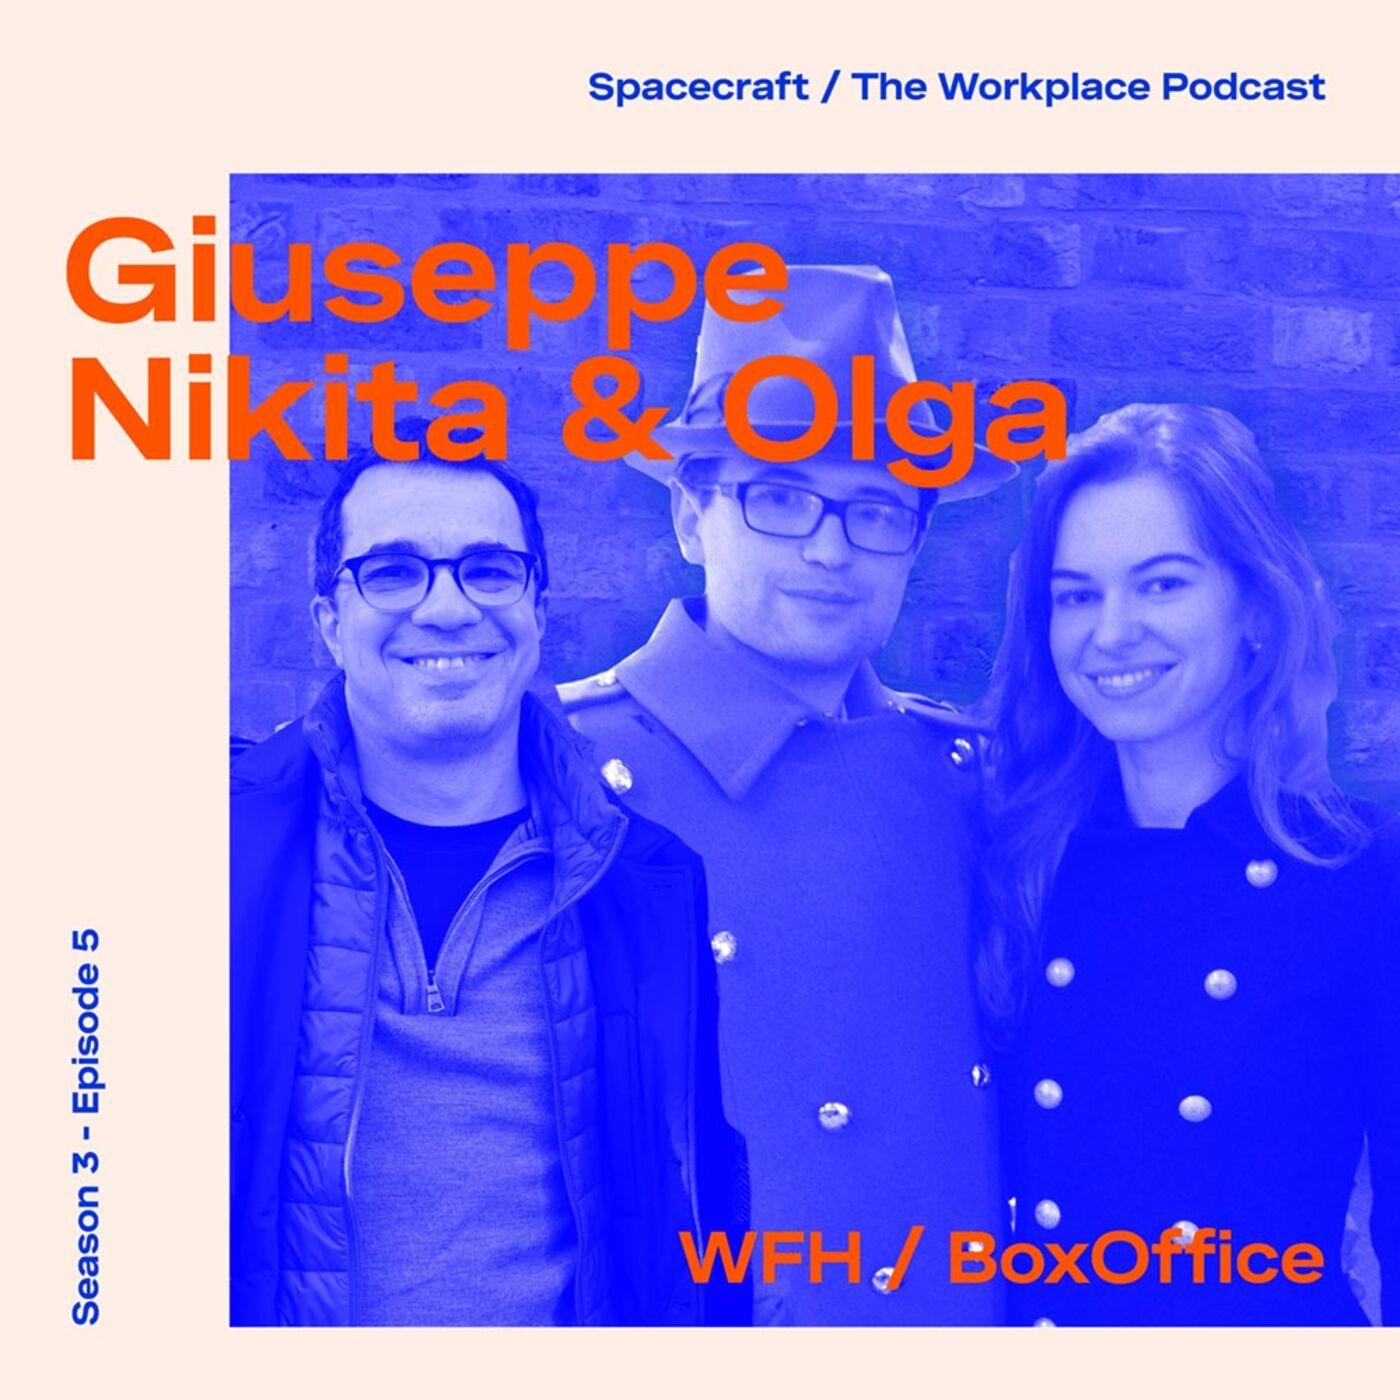 Giuseppe Boscherini, Nikita Mikhailov & Olga Vysotska — How are you feeling?